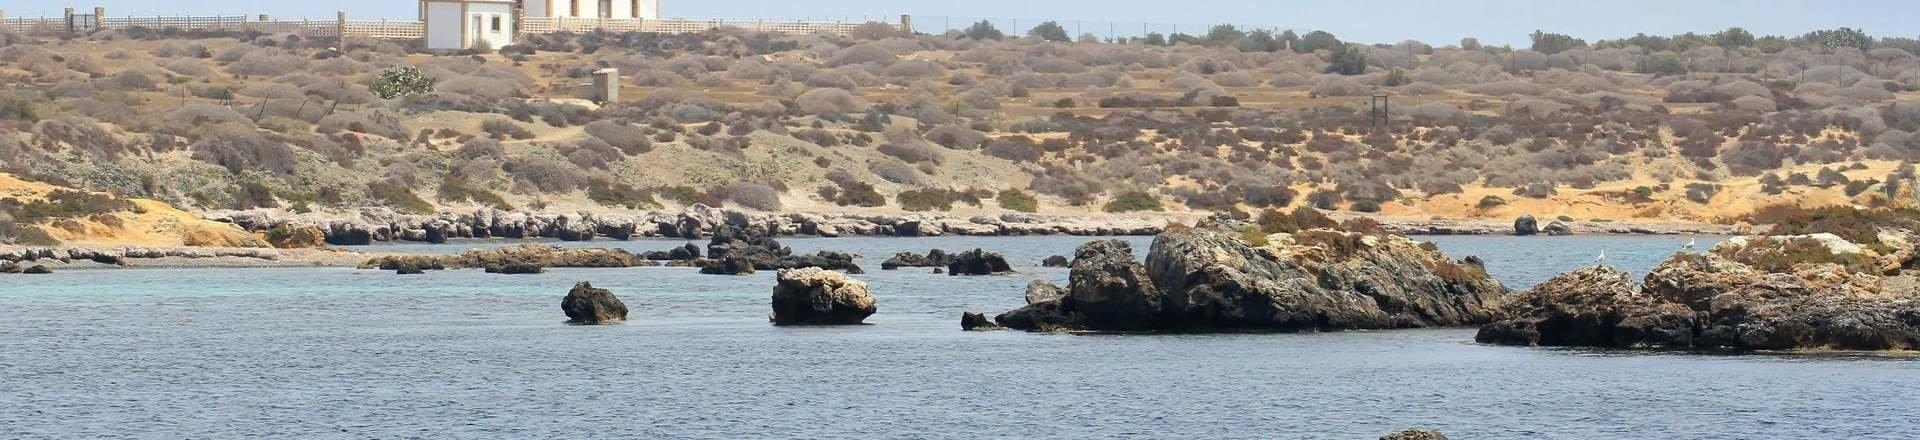 Hoteles en isla tabarca baratos desde 1 262 destinia - Hoteles en isla tabarca ...